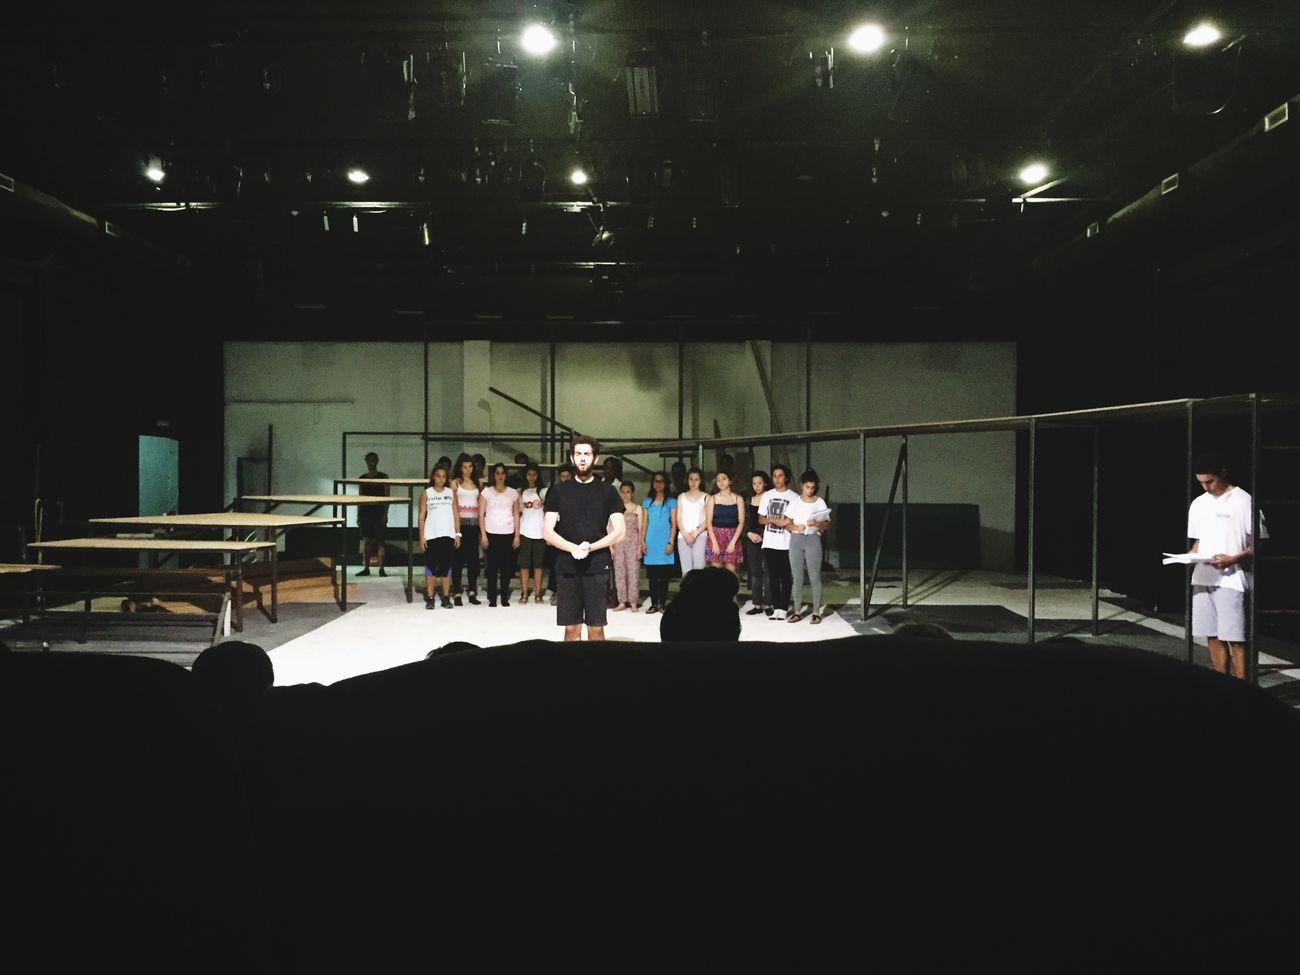 PeerGynt Theatre Tec Actors Myworld